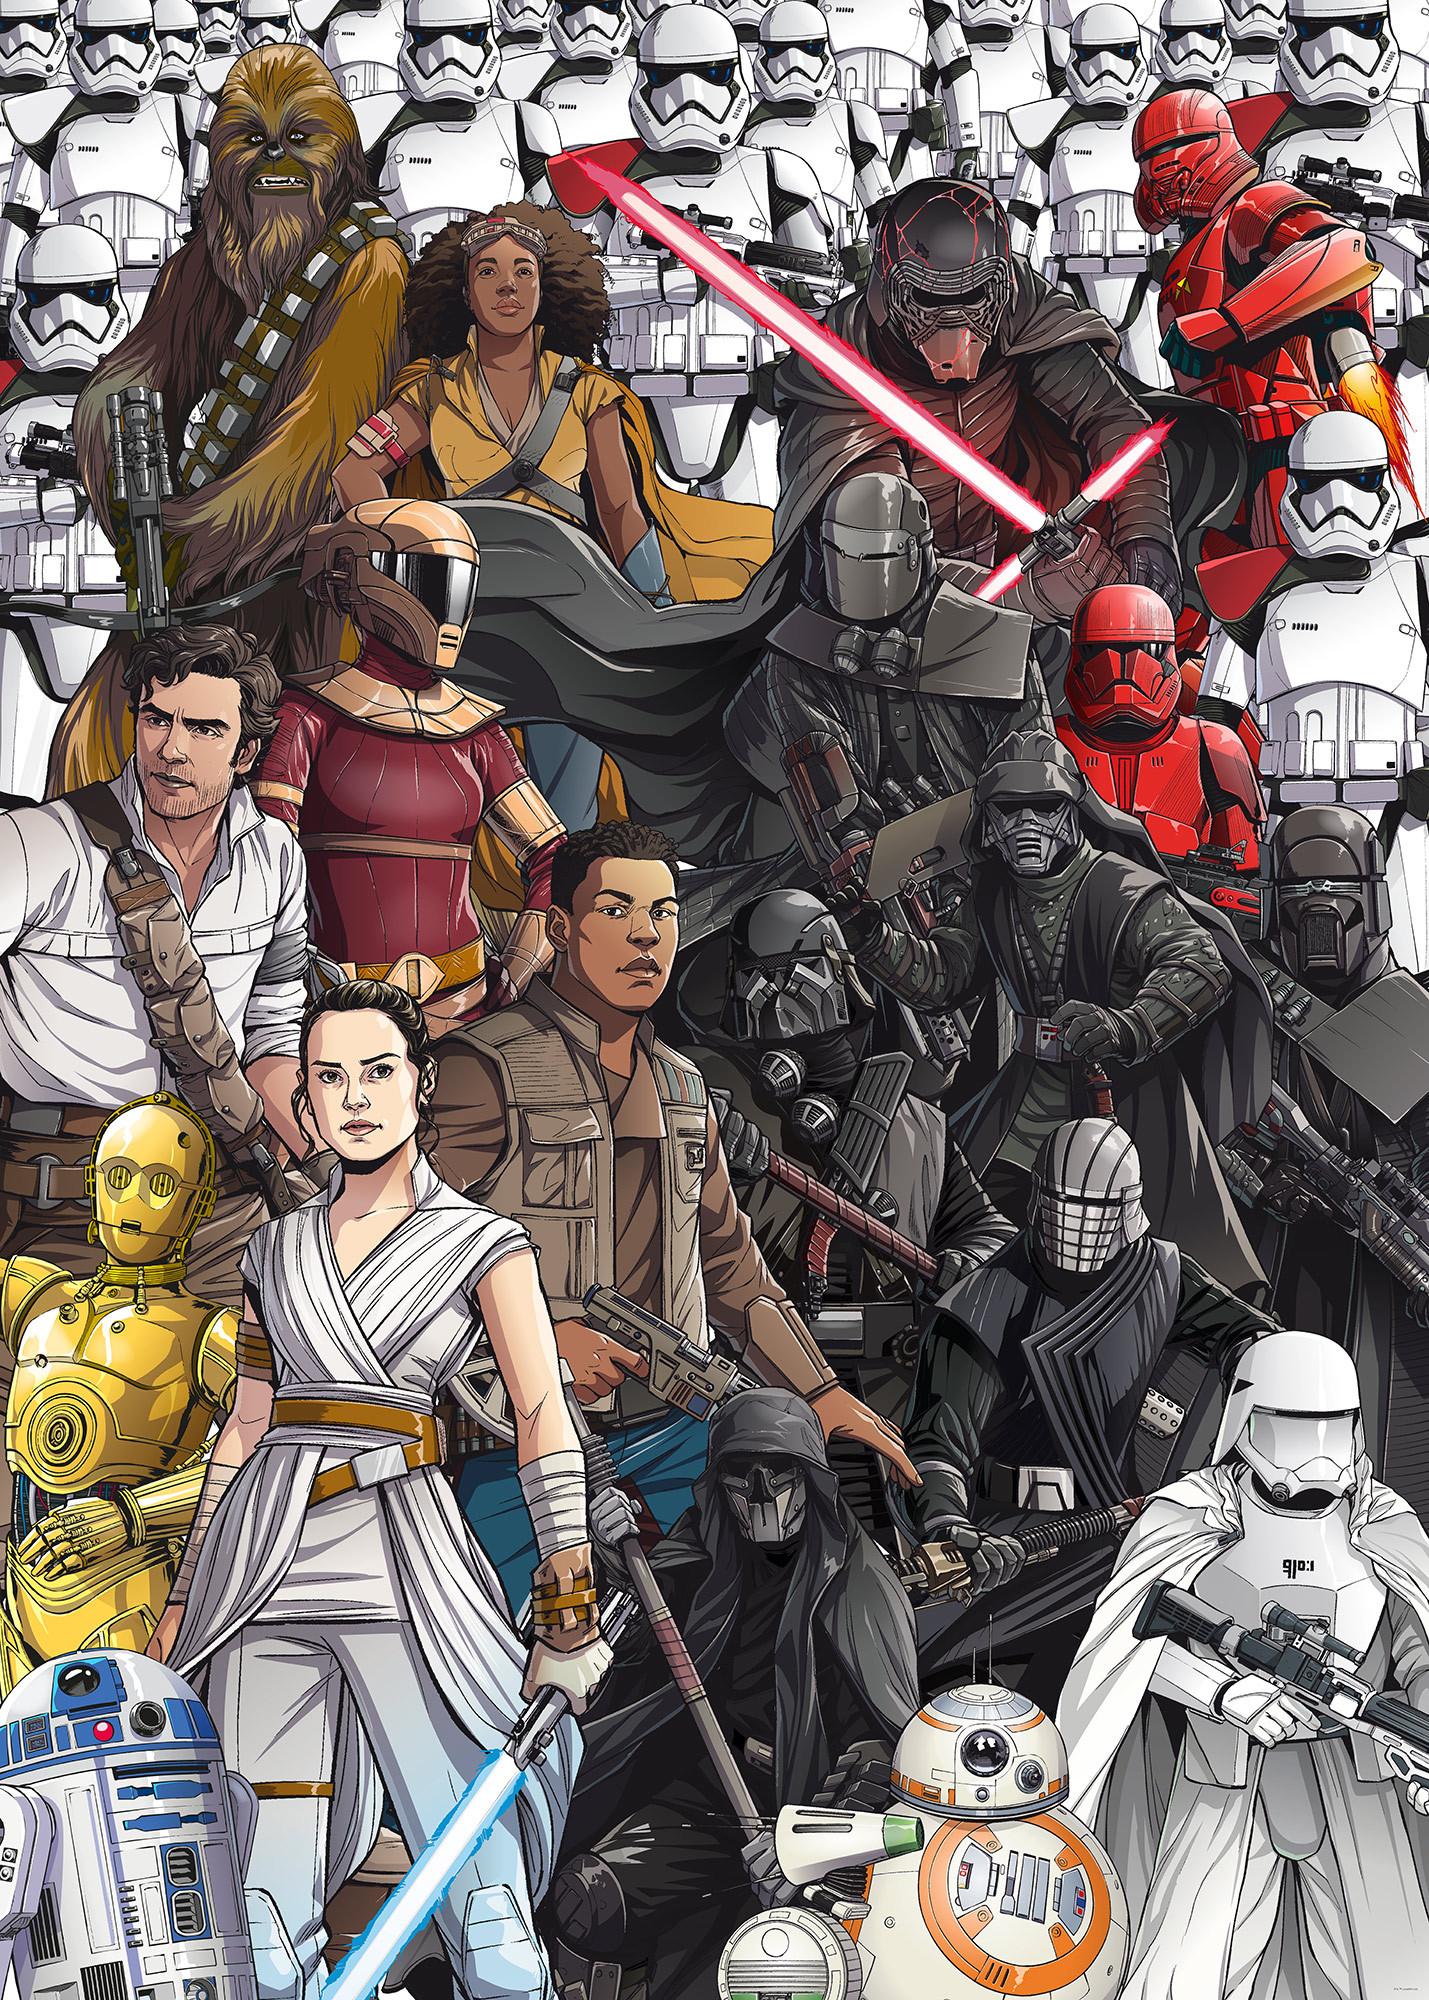 Star Wars Retro Cartoon